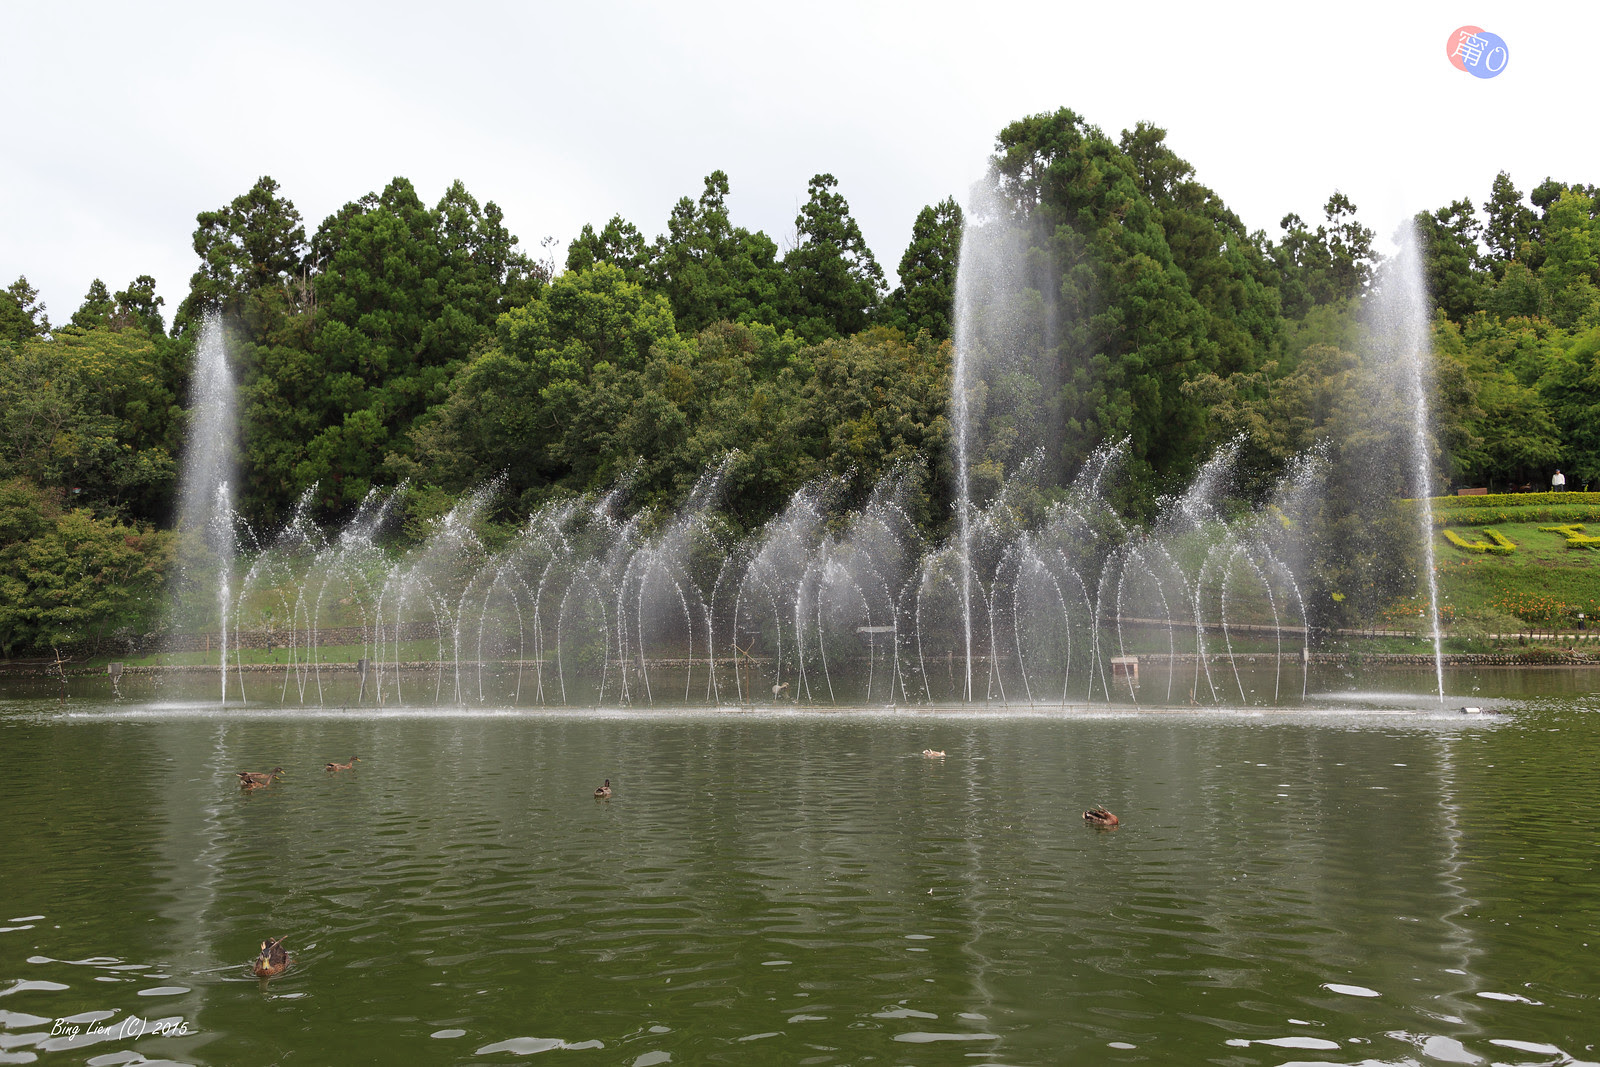 WATER_BING5554_LR